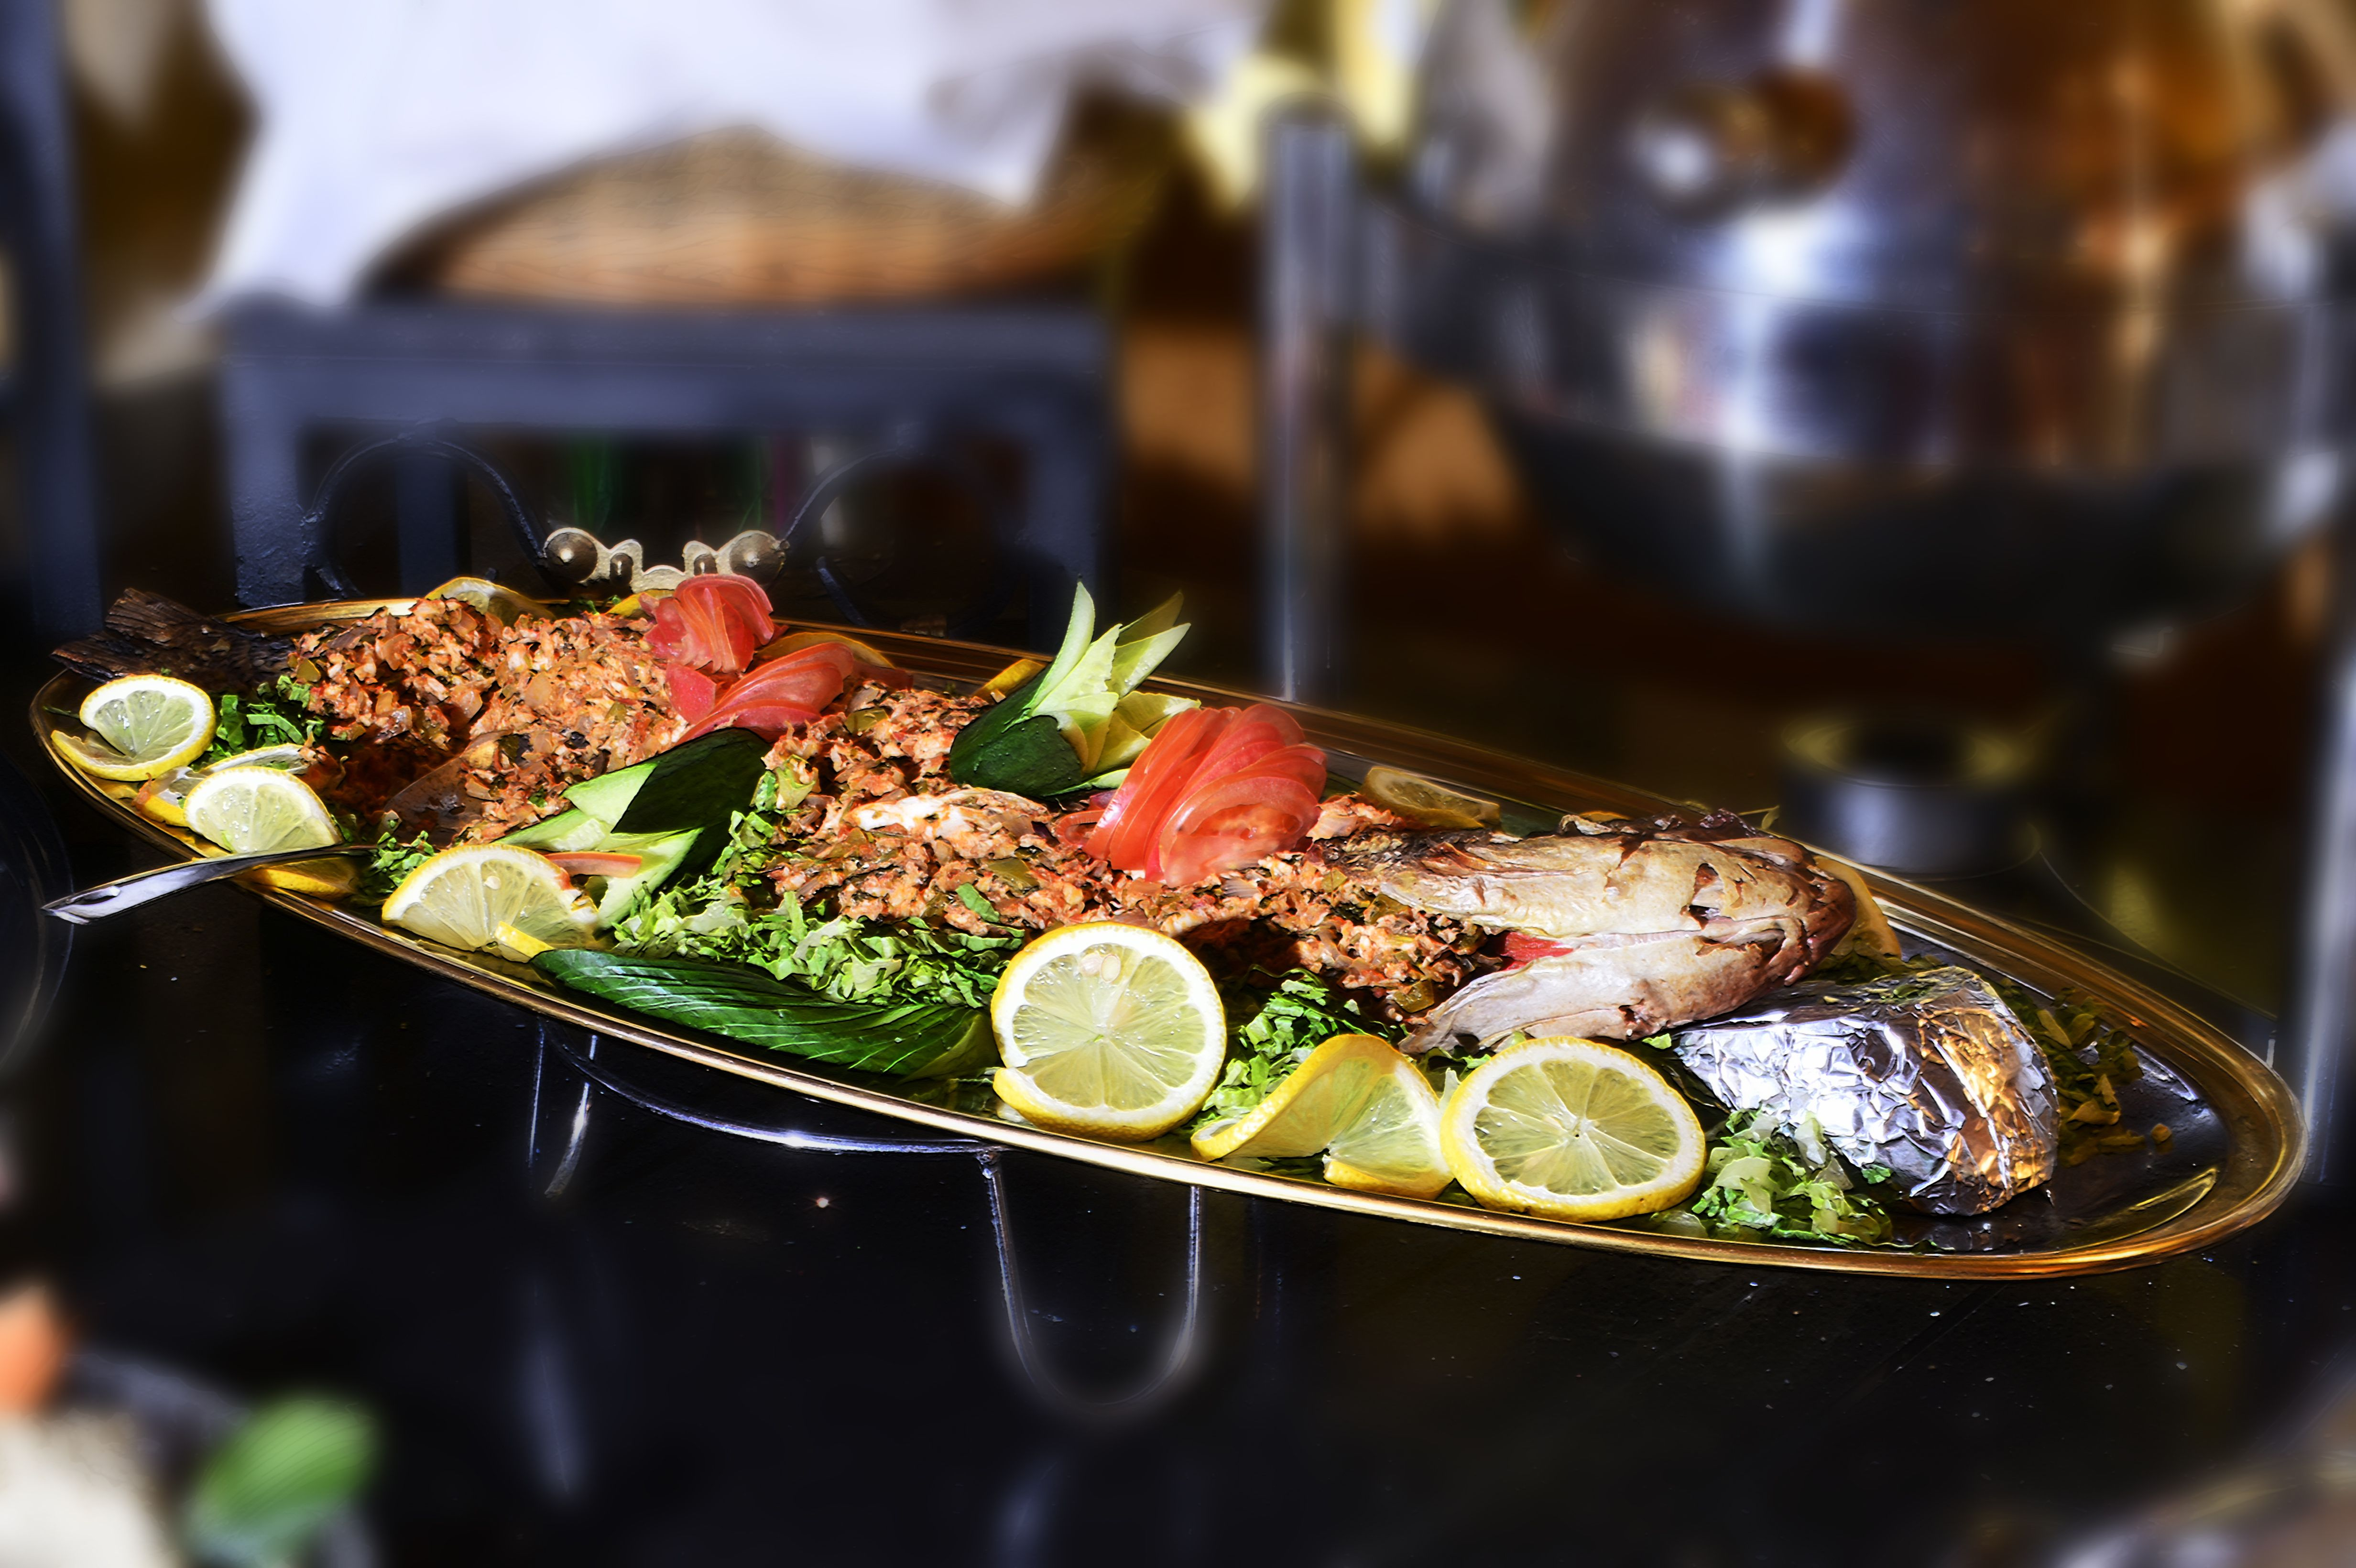 سمك مامور مشوي في مطعم اميرة فندق قصر الستين Fish And Seafood Food Eat